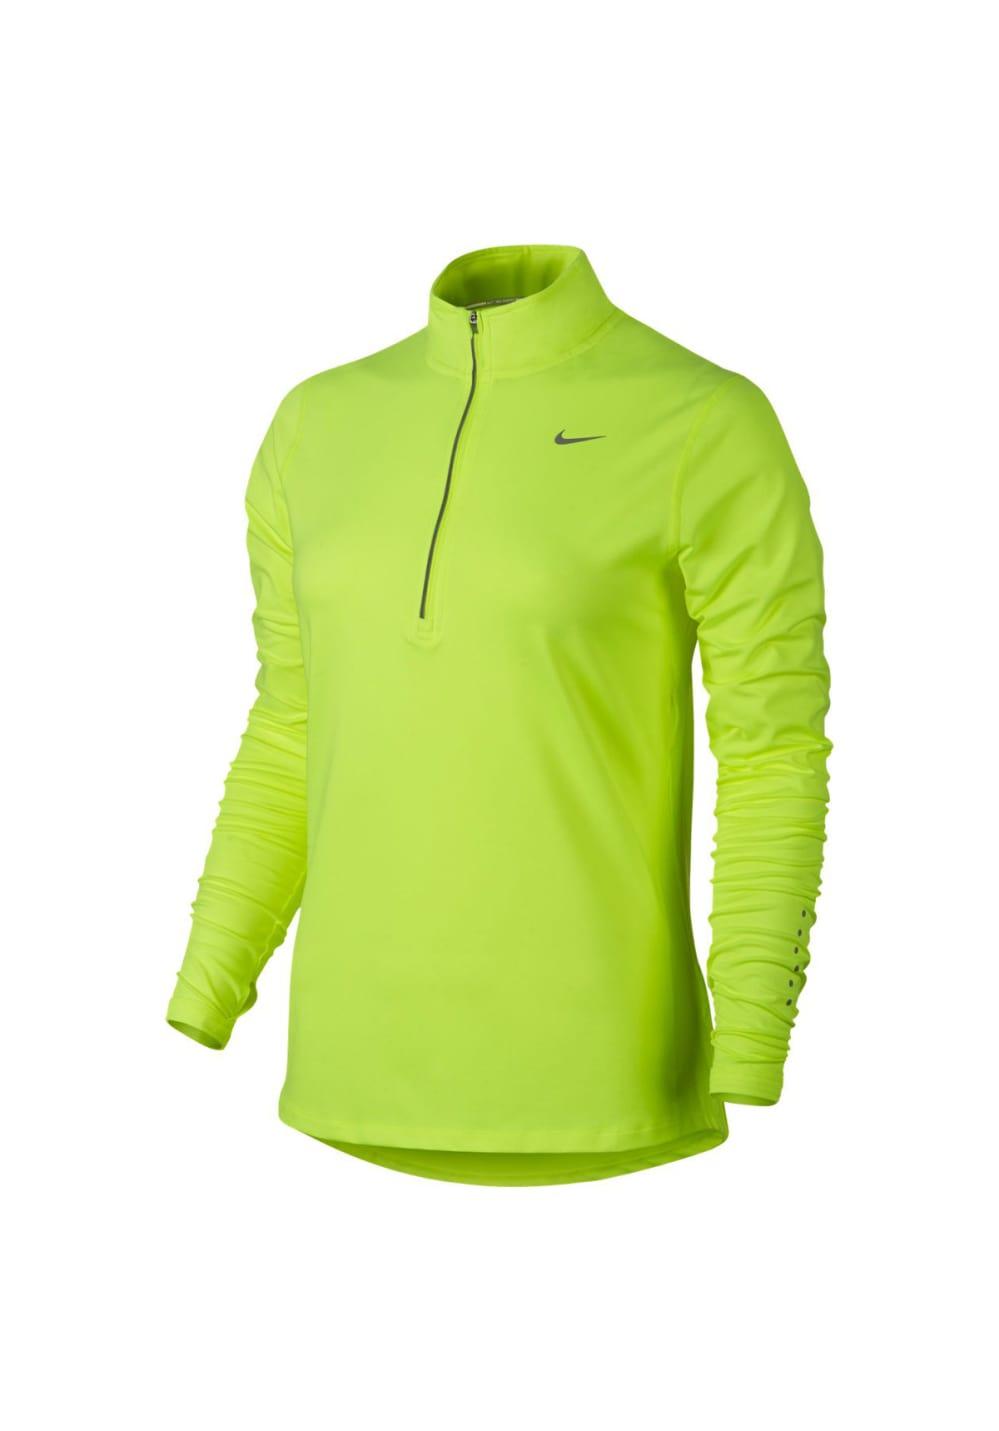 De Para Half Long Element Nike Fit Zip Dri Sleeve Mujer Camisetas Amarillo Running 9HID2E